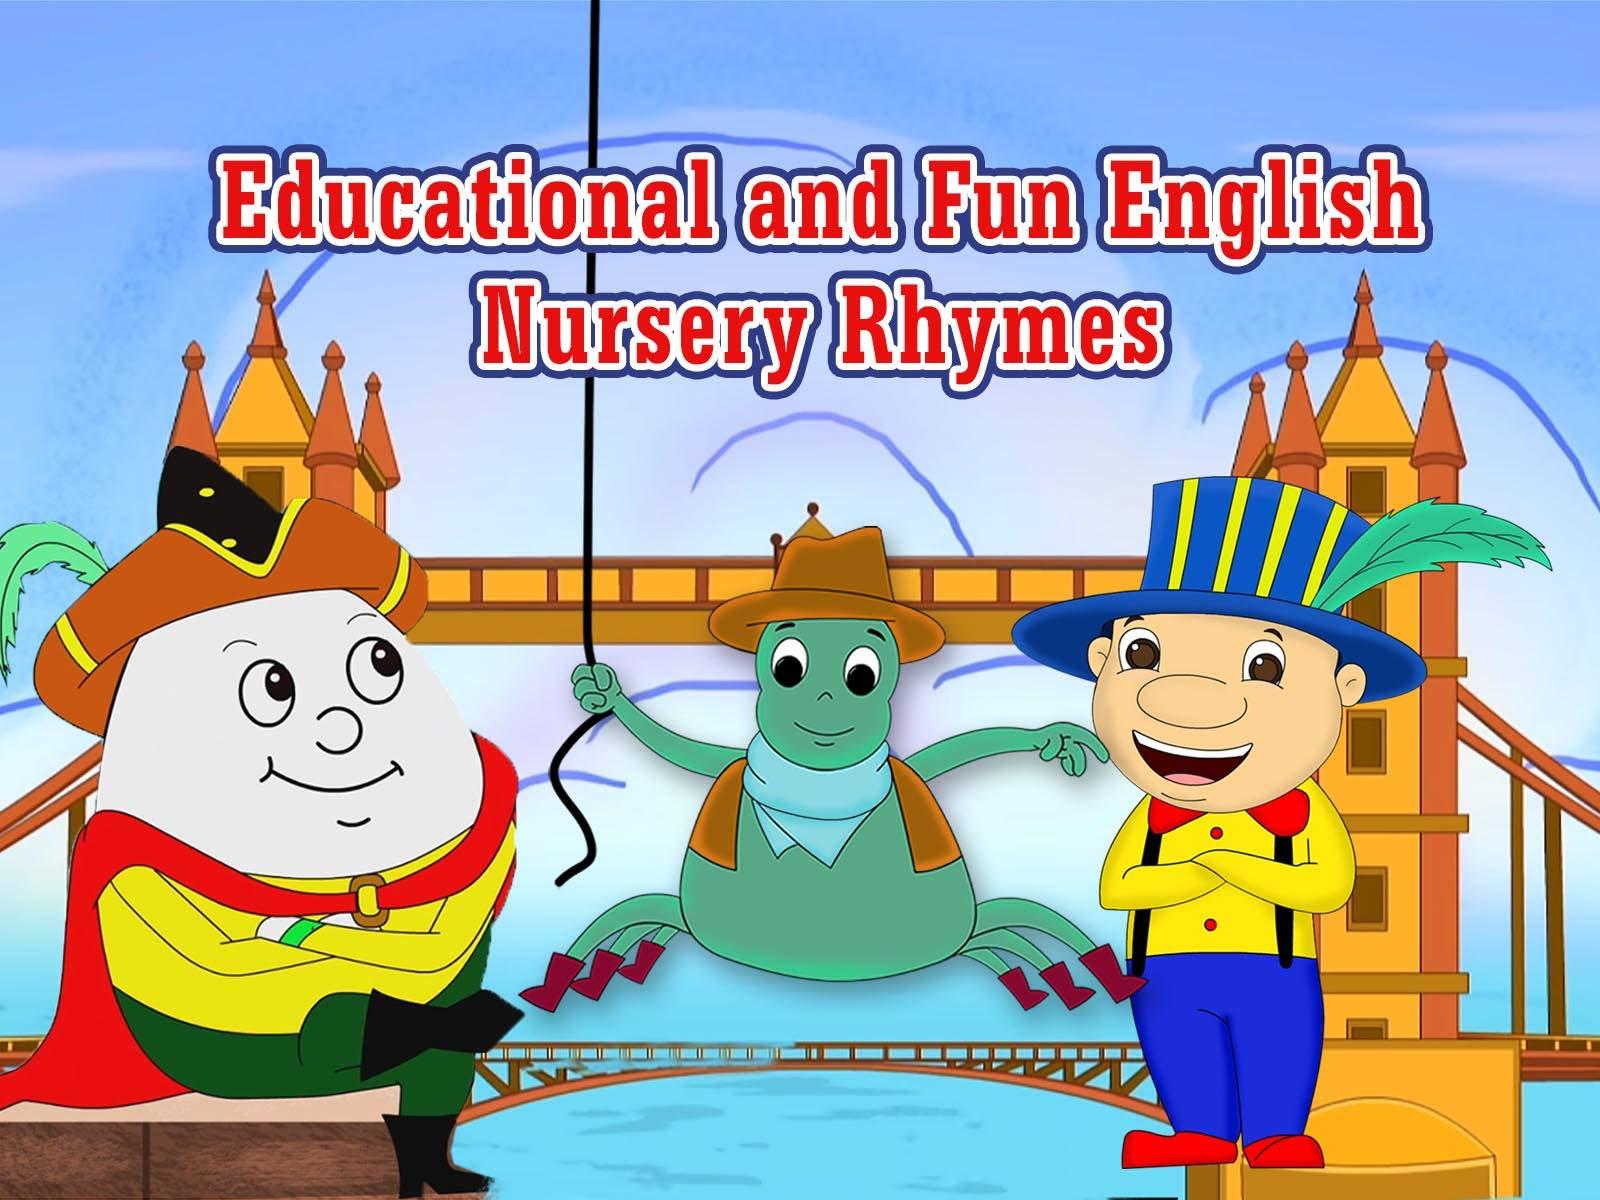 Educational and Fun English Nursery Rhymes - Season 1